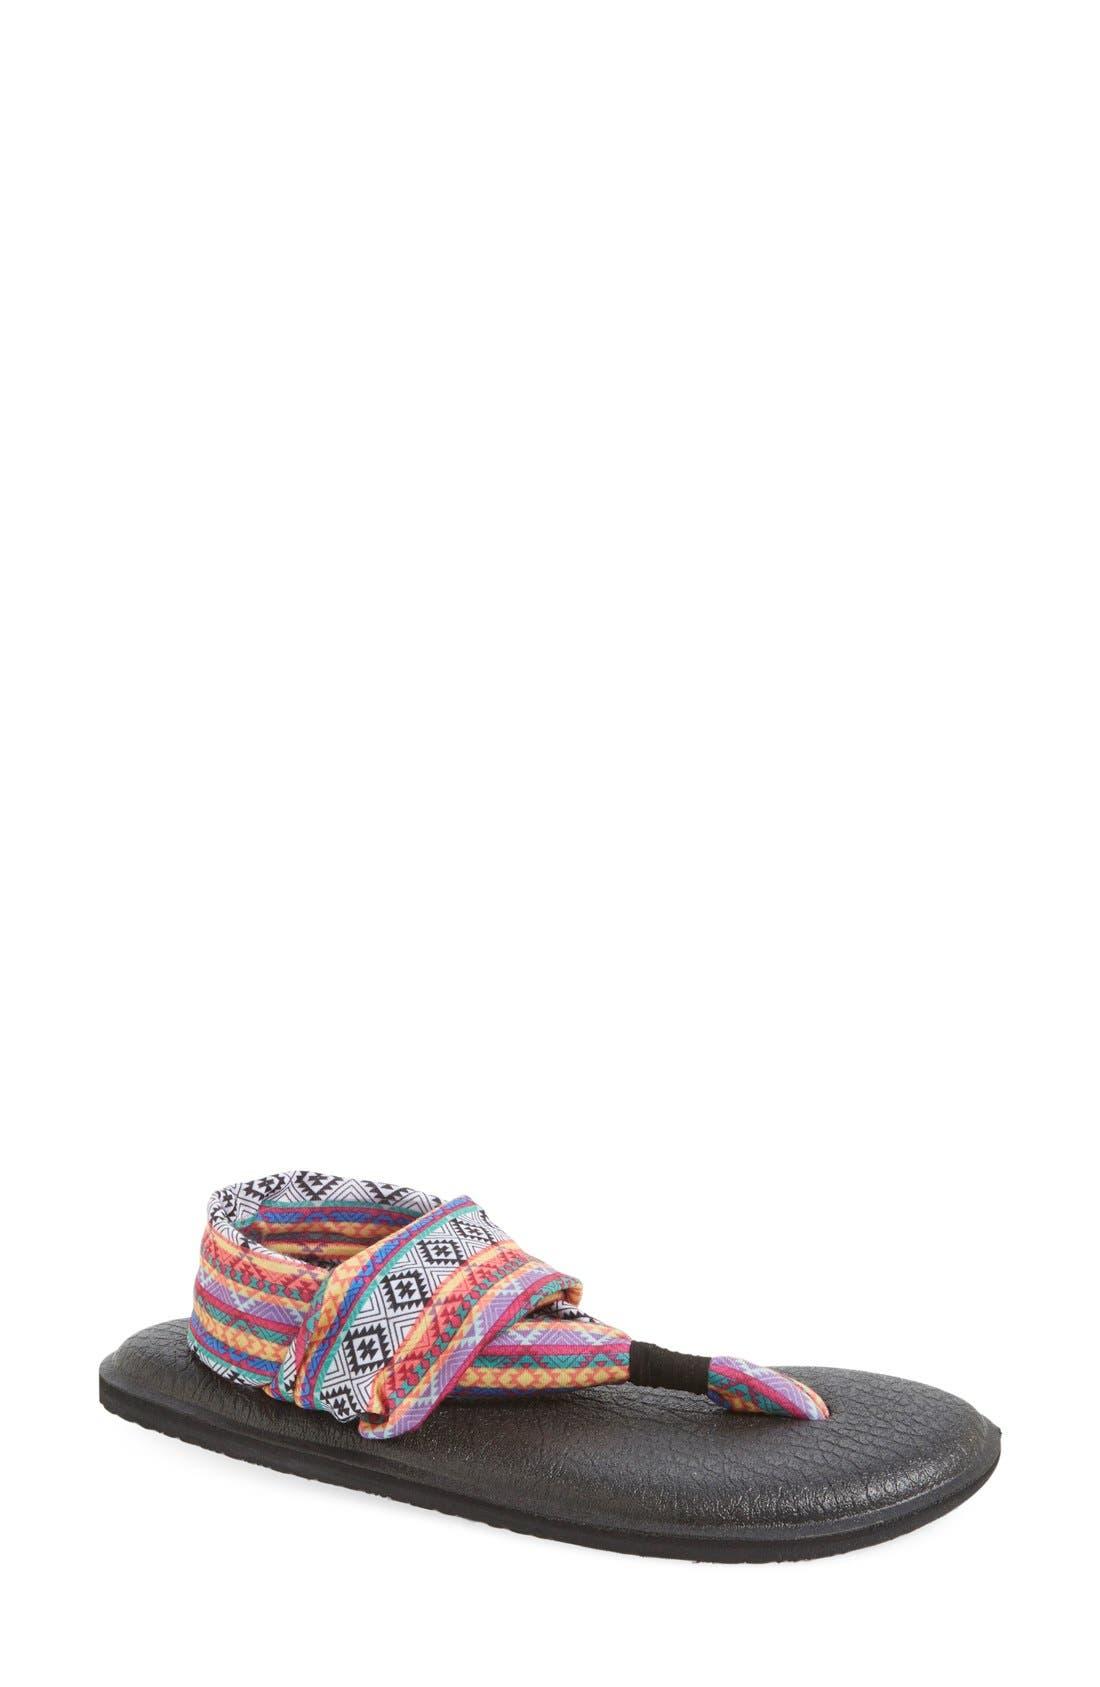 'Yoga Sling 2' Sandal,                         Main,                         color, Magenta/ Multi Tribal Stripe